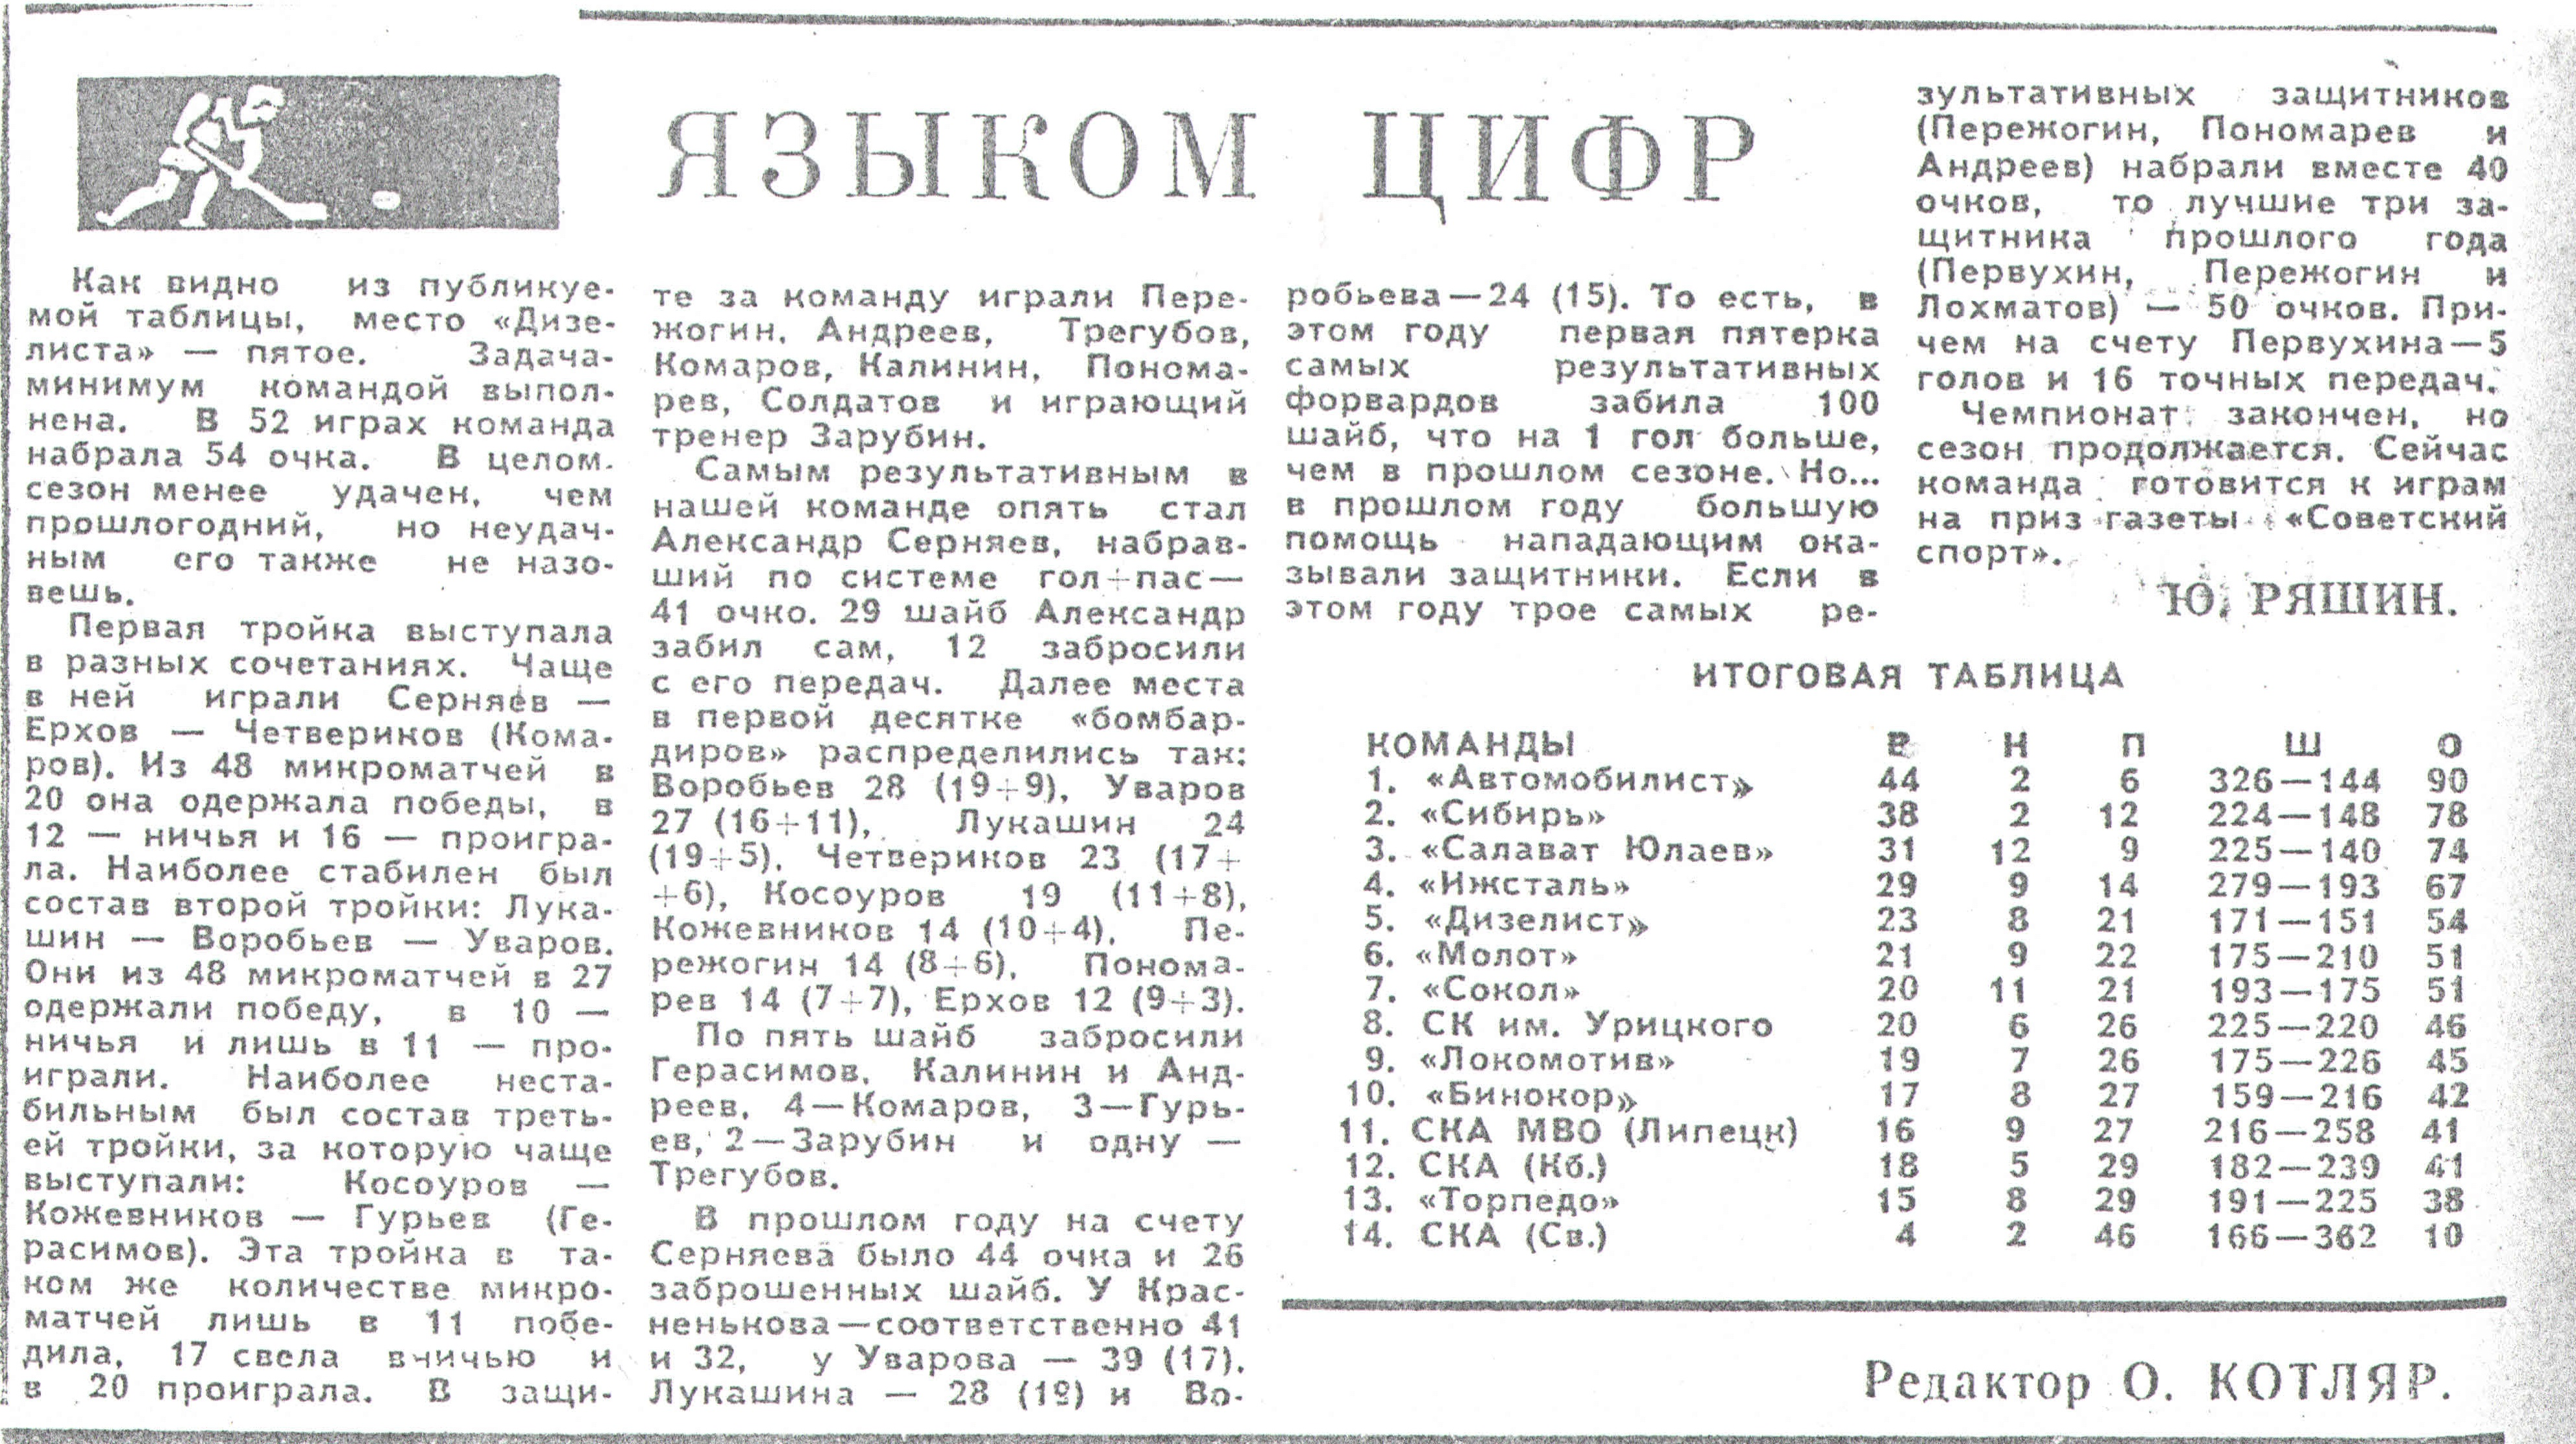 1976-77 итоги.jpg